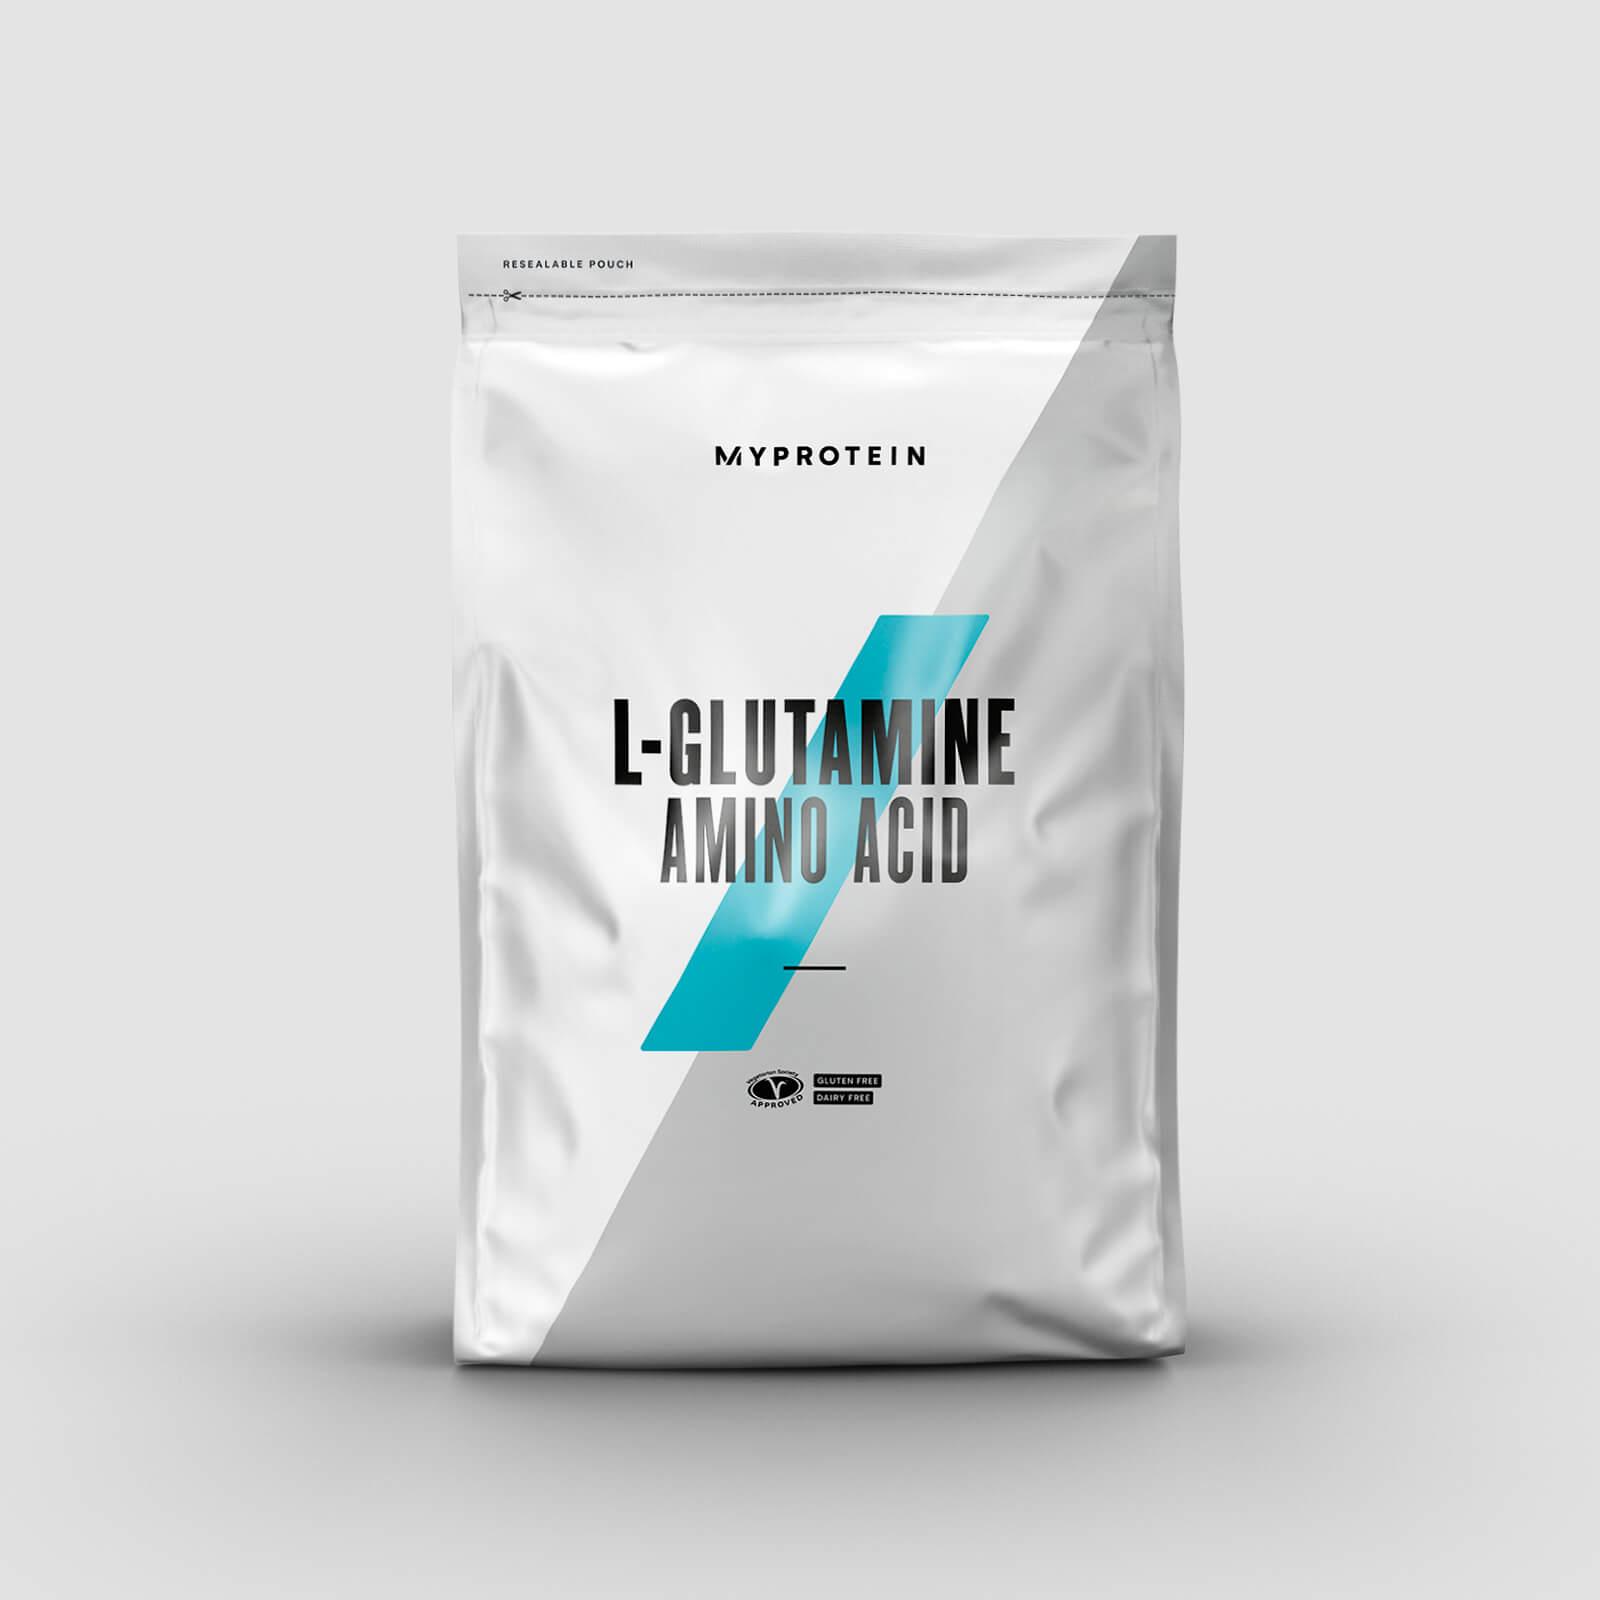 L-Glutamin Aminosäuren - 500g - Geschmacksneutral